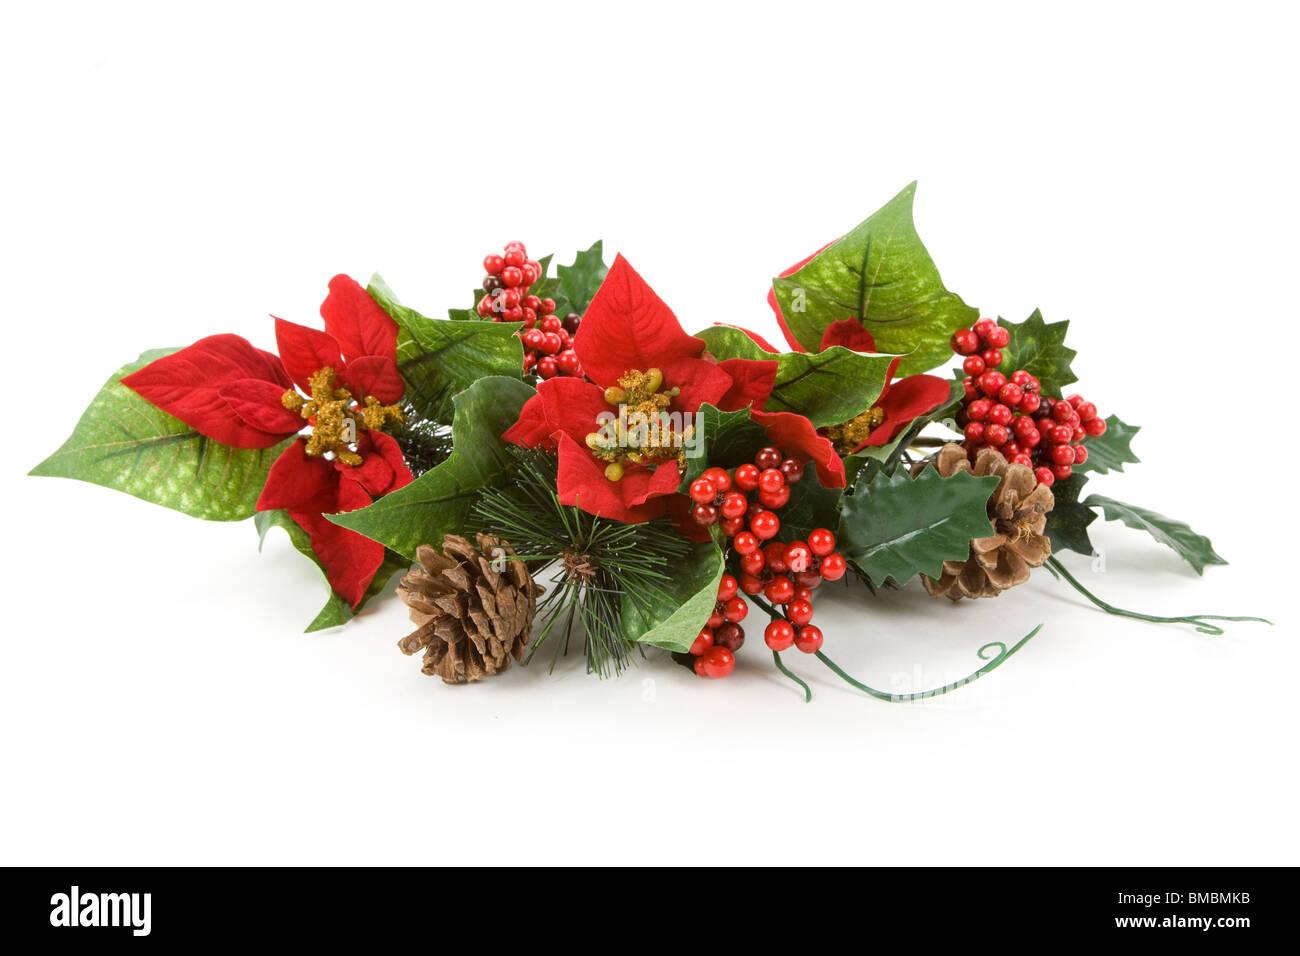 Christmas Decoration, Poinsettia, Pinecone, Holly - Stock Image